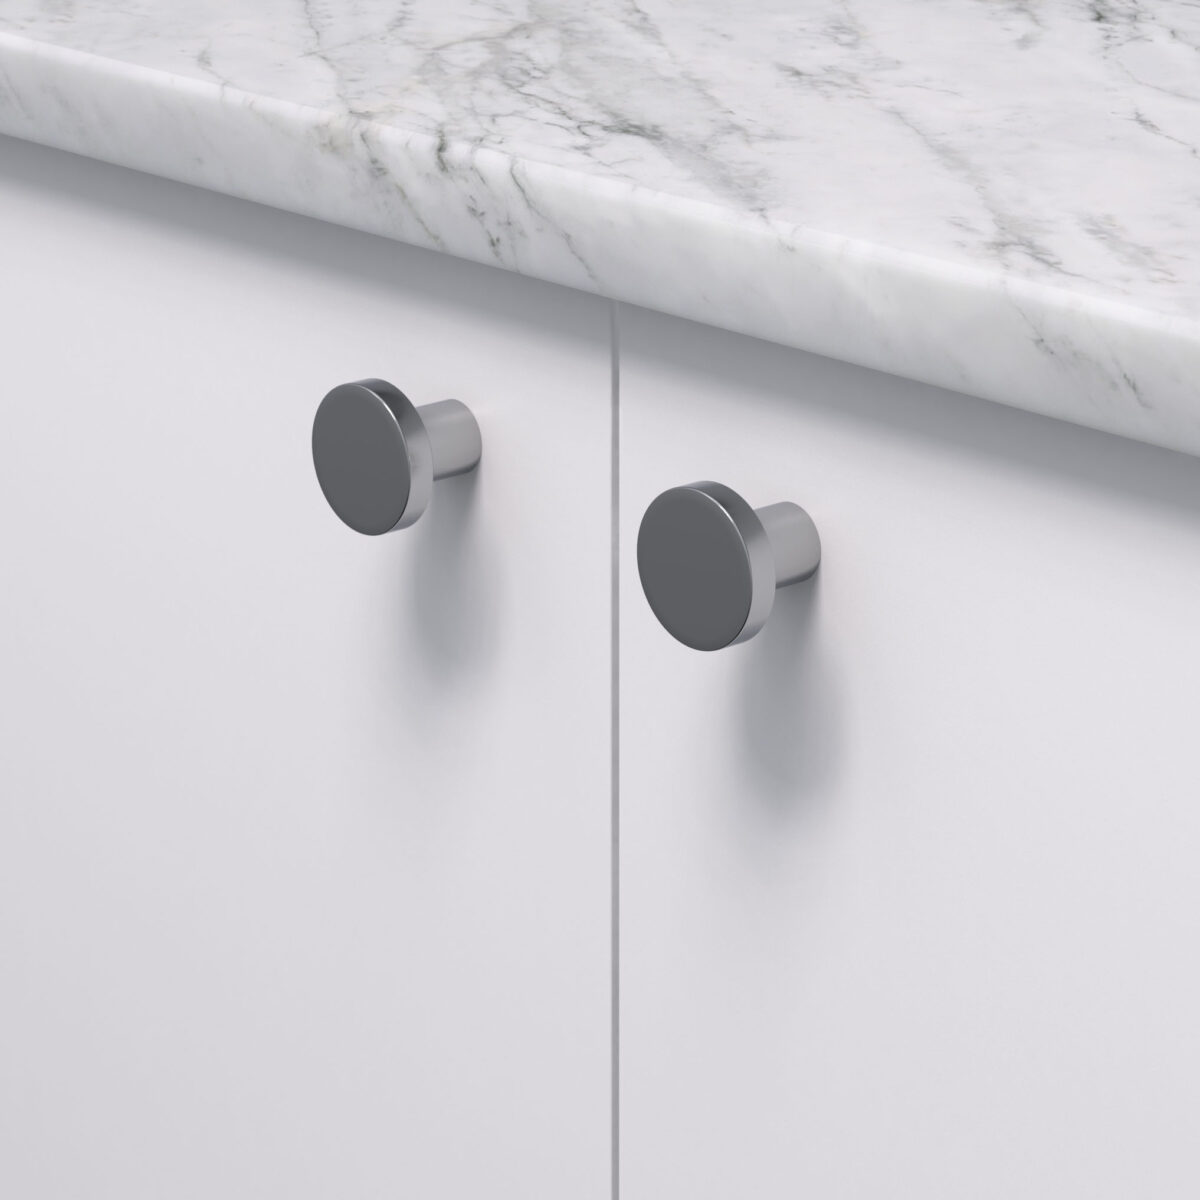 Knopp 2078 krom 368011 11 28 mm ncs s 0300 n marmor carrara